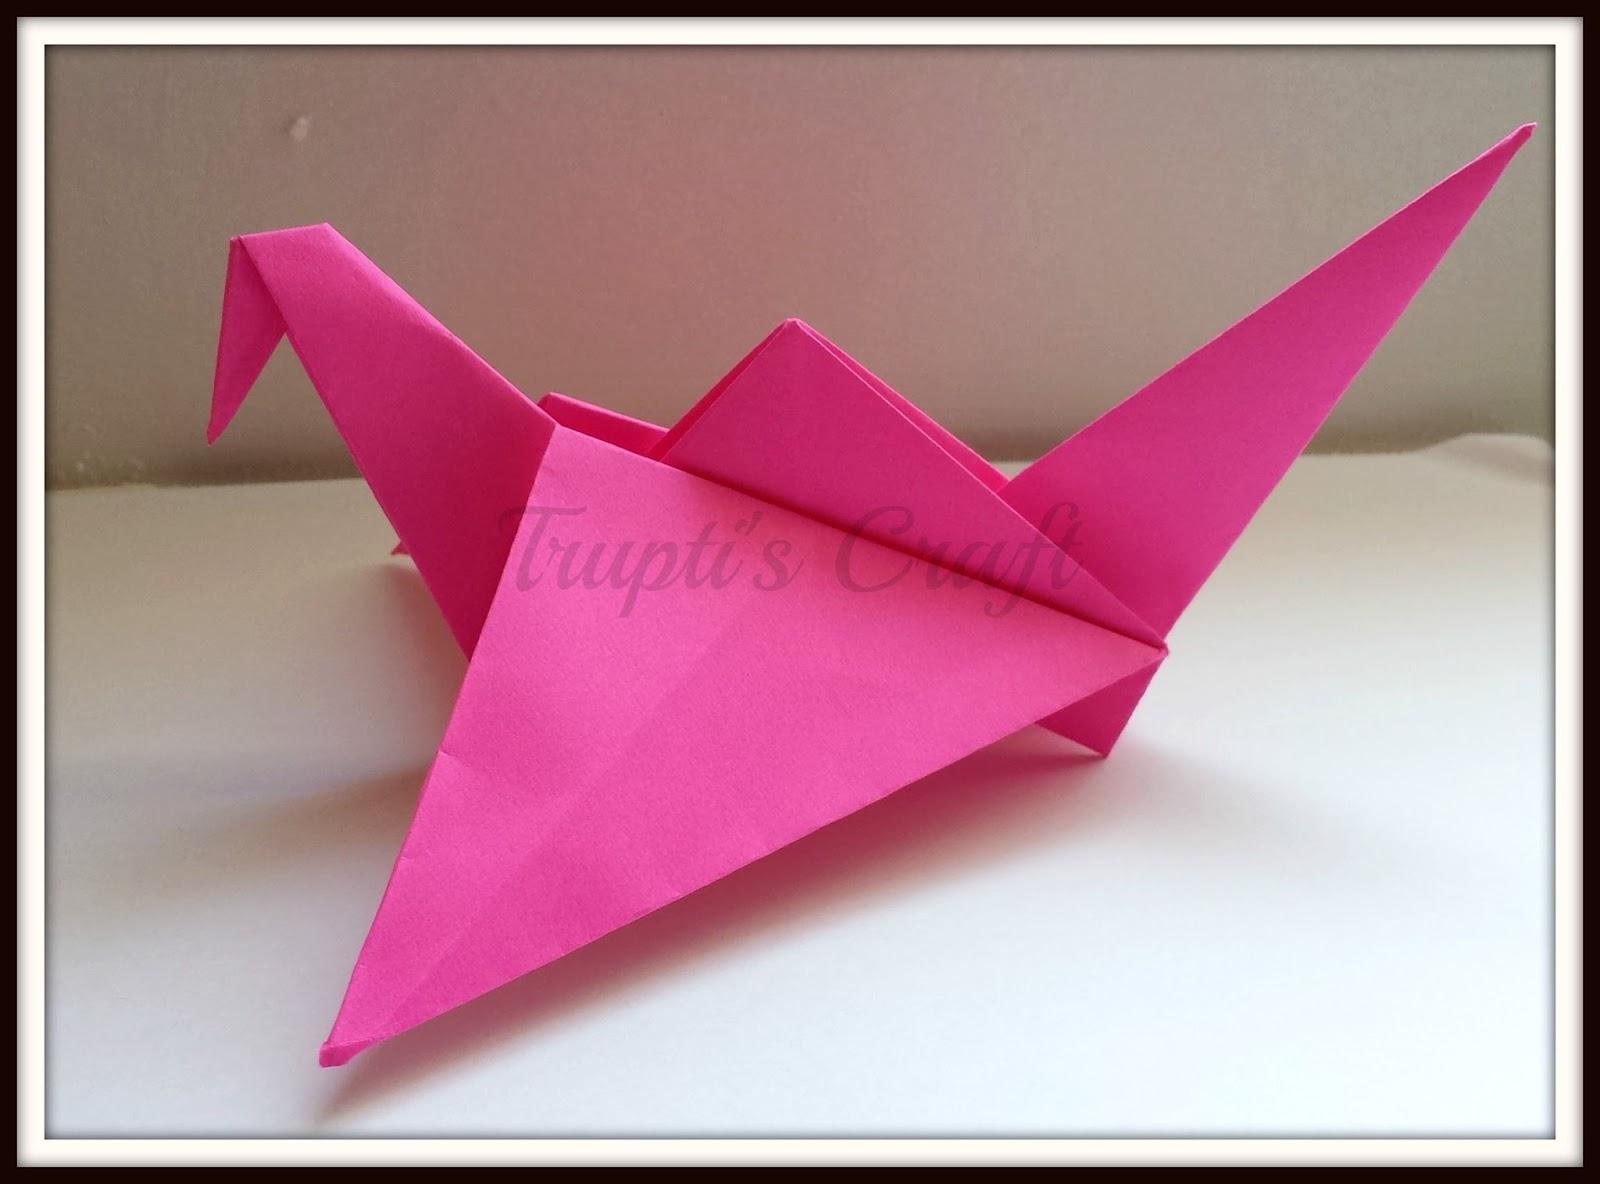 truptis craft origami flapping bird